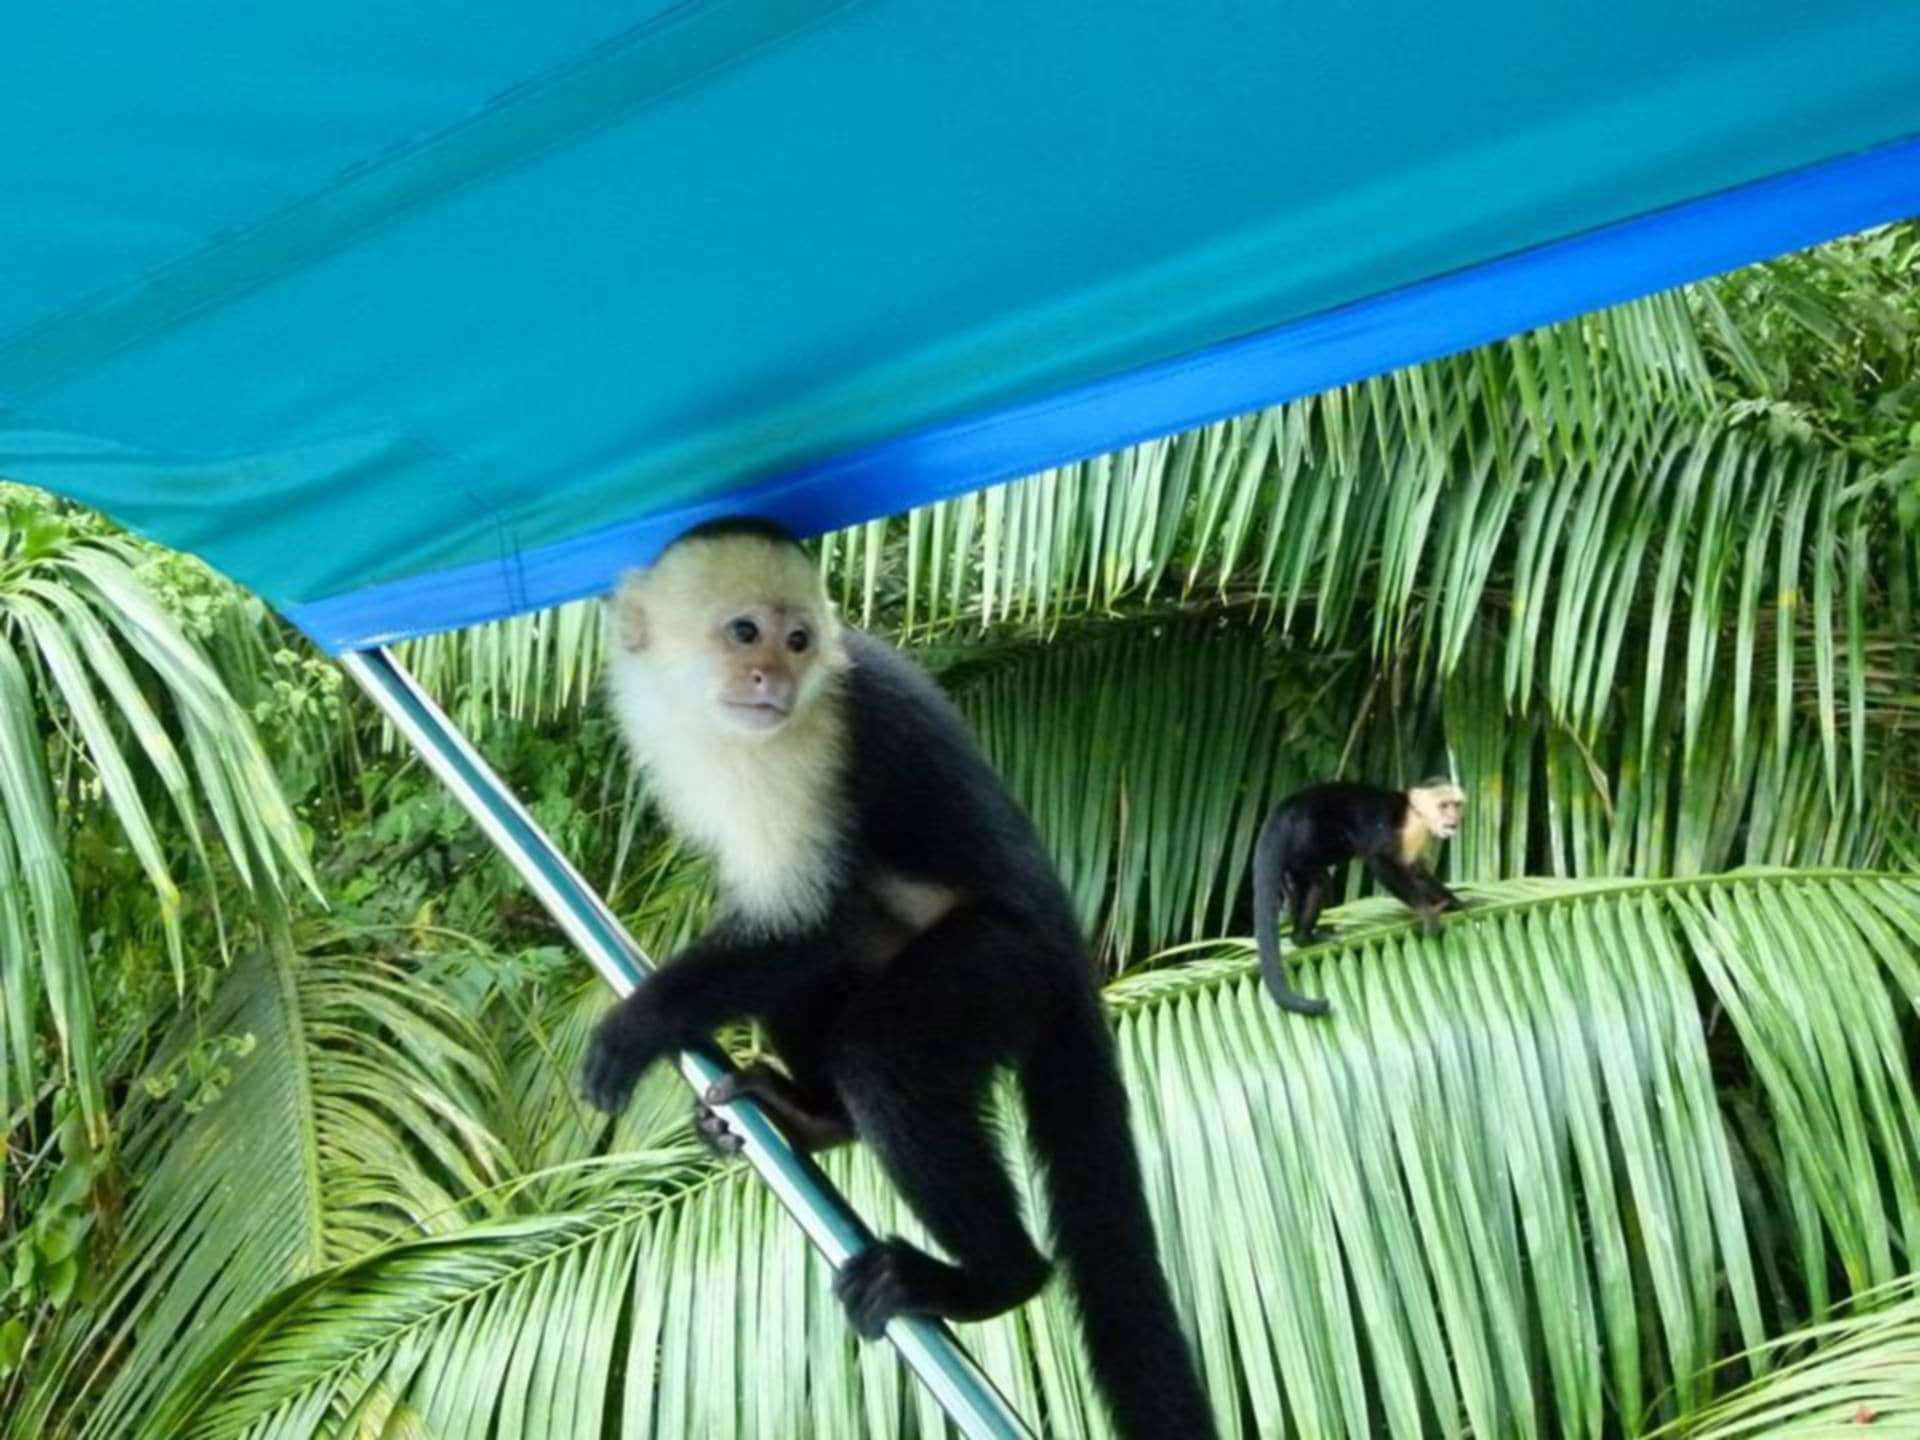 kokomana-kokopelli-logo-restaurant-sierpe-ballena-tales-osa-enjoy-tours-puravida-nature-iguana-nature-monkey-nature